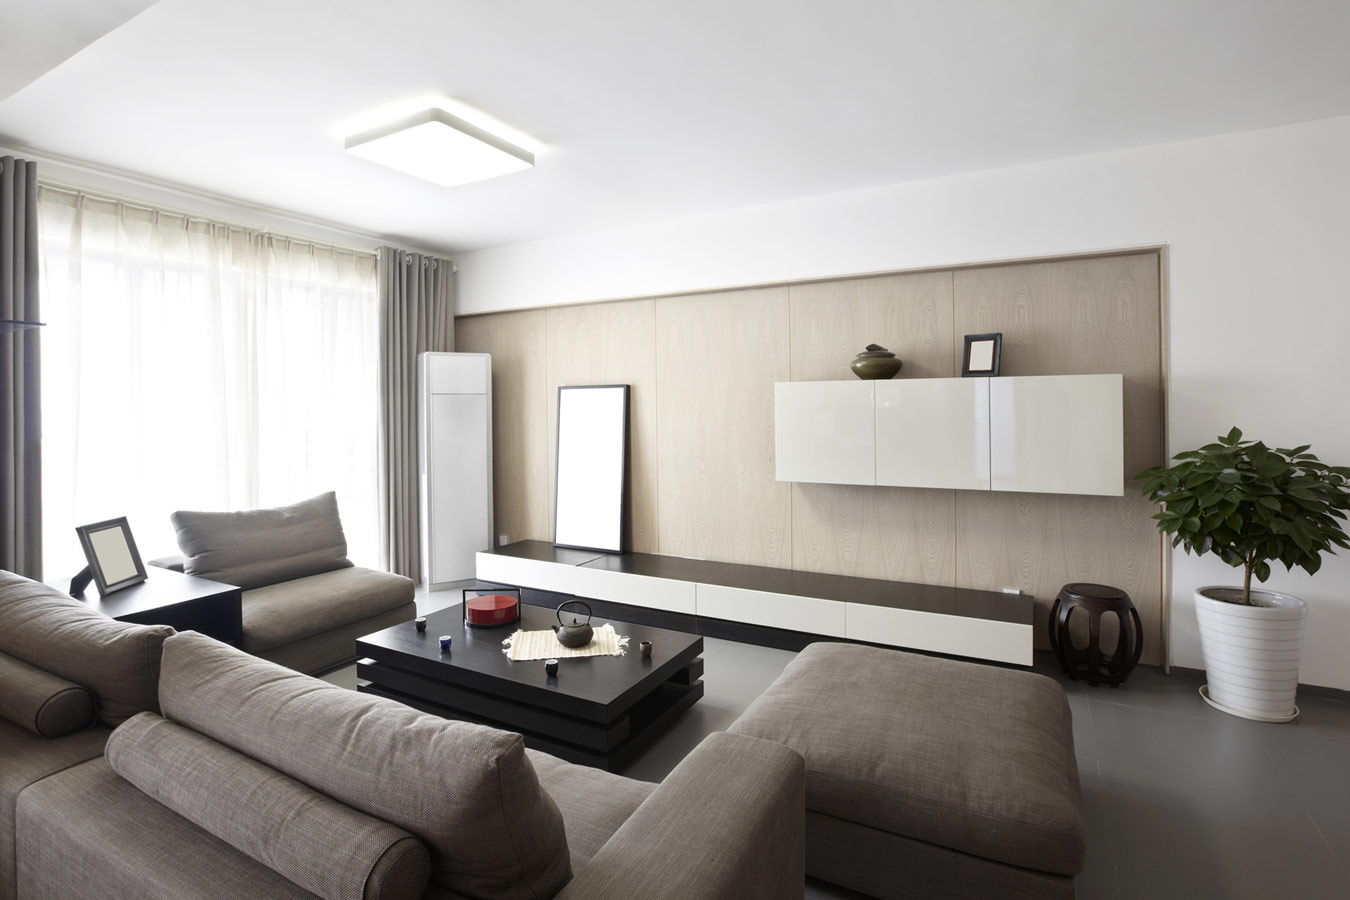 Woonkamer inrichten tips idee n inspiratie - Interieur decoratie modern hout ...